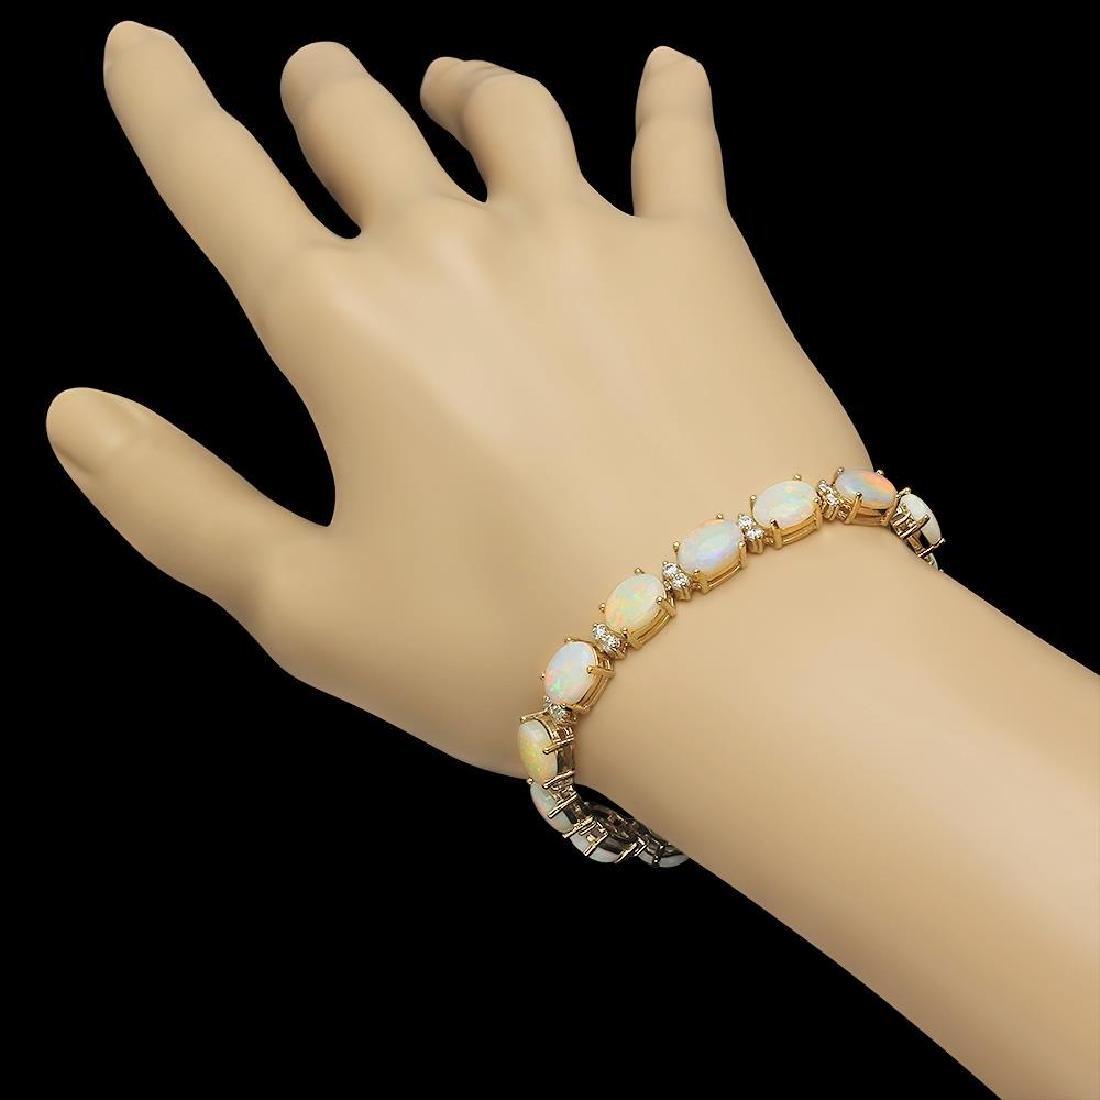 14K Gold 16.97ct Opal 1.45ct Diamond Bracelet - 2